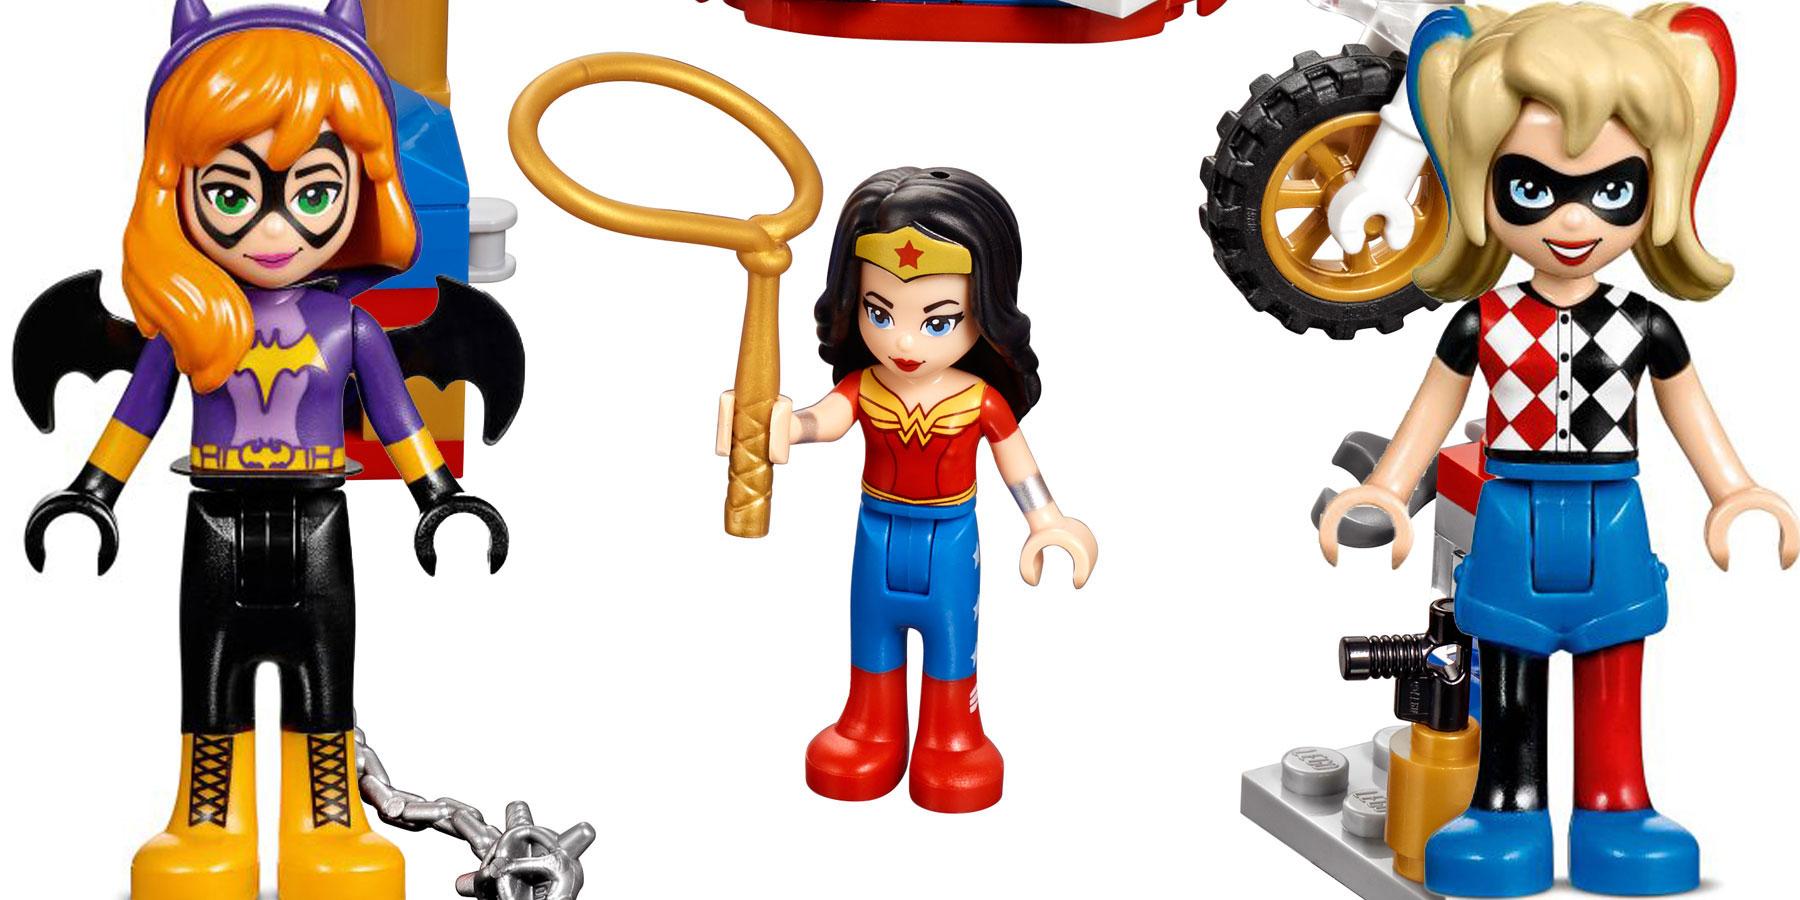 lego launches dc super hero girls line